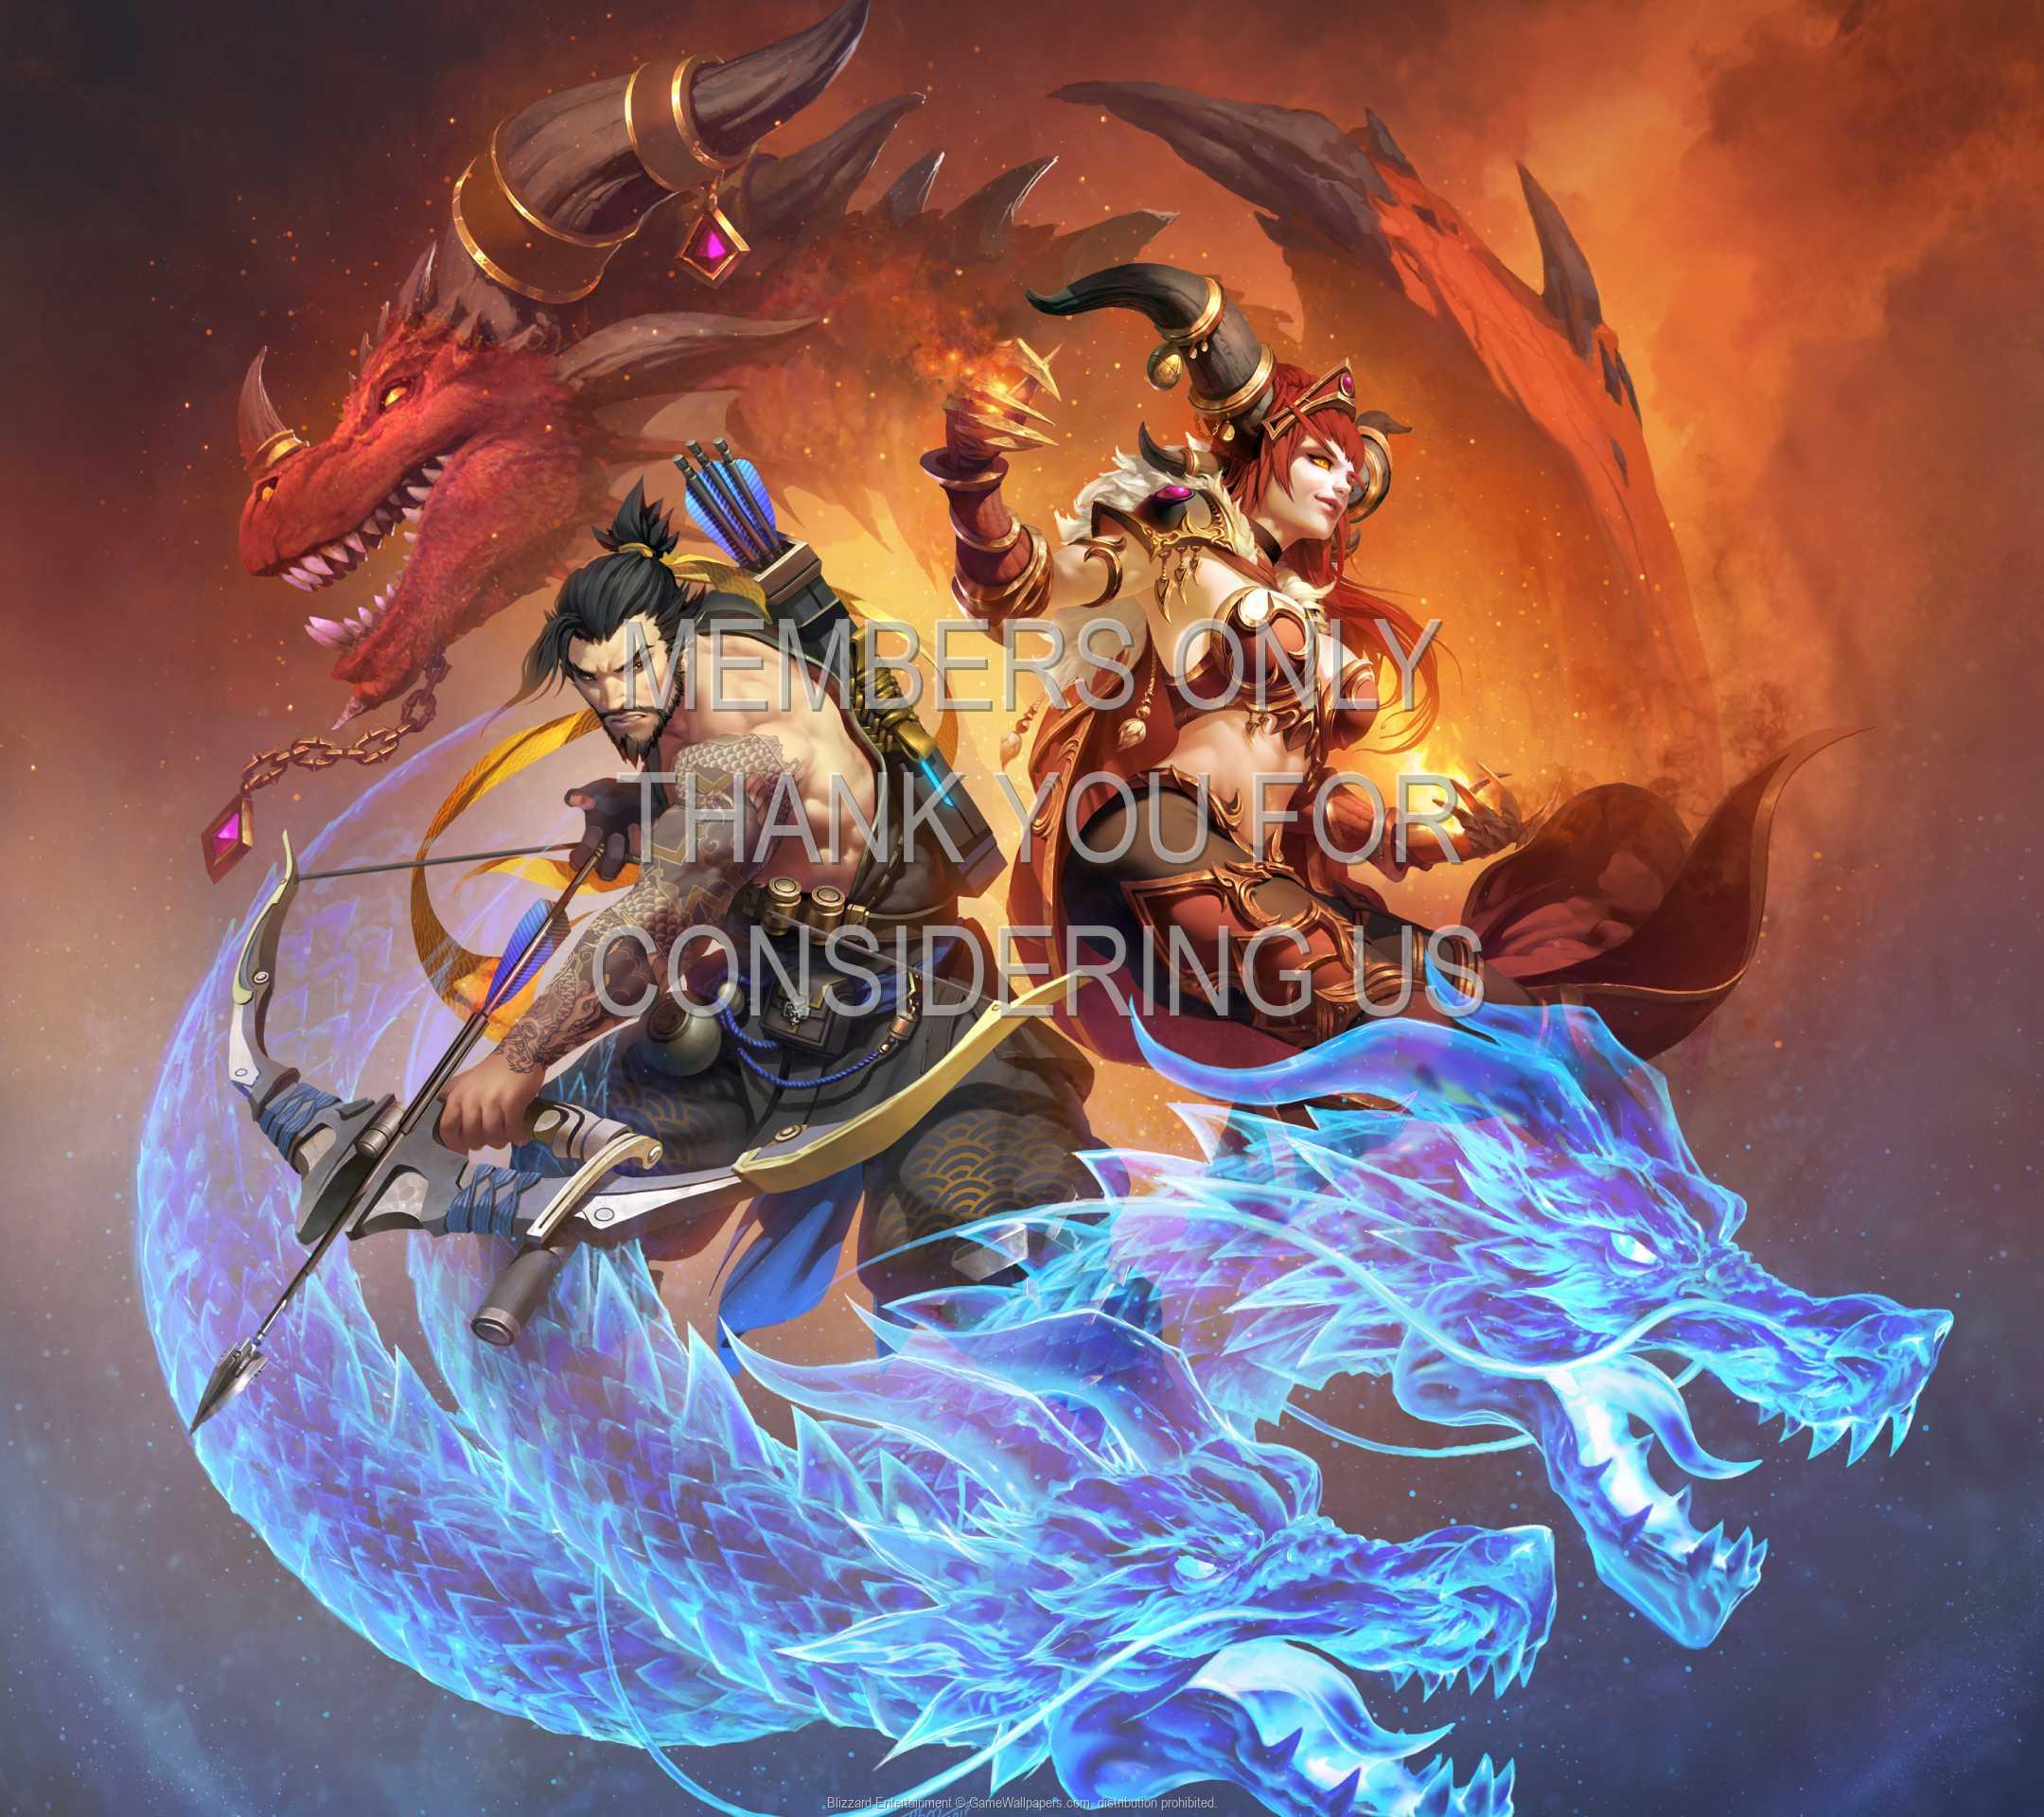 Blizzard Entertainment 1080p Horizontal Mobile wallpaper or background 04